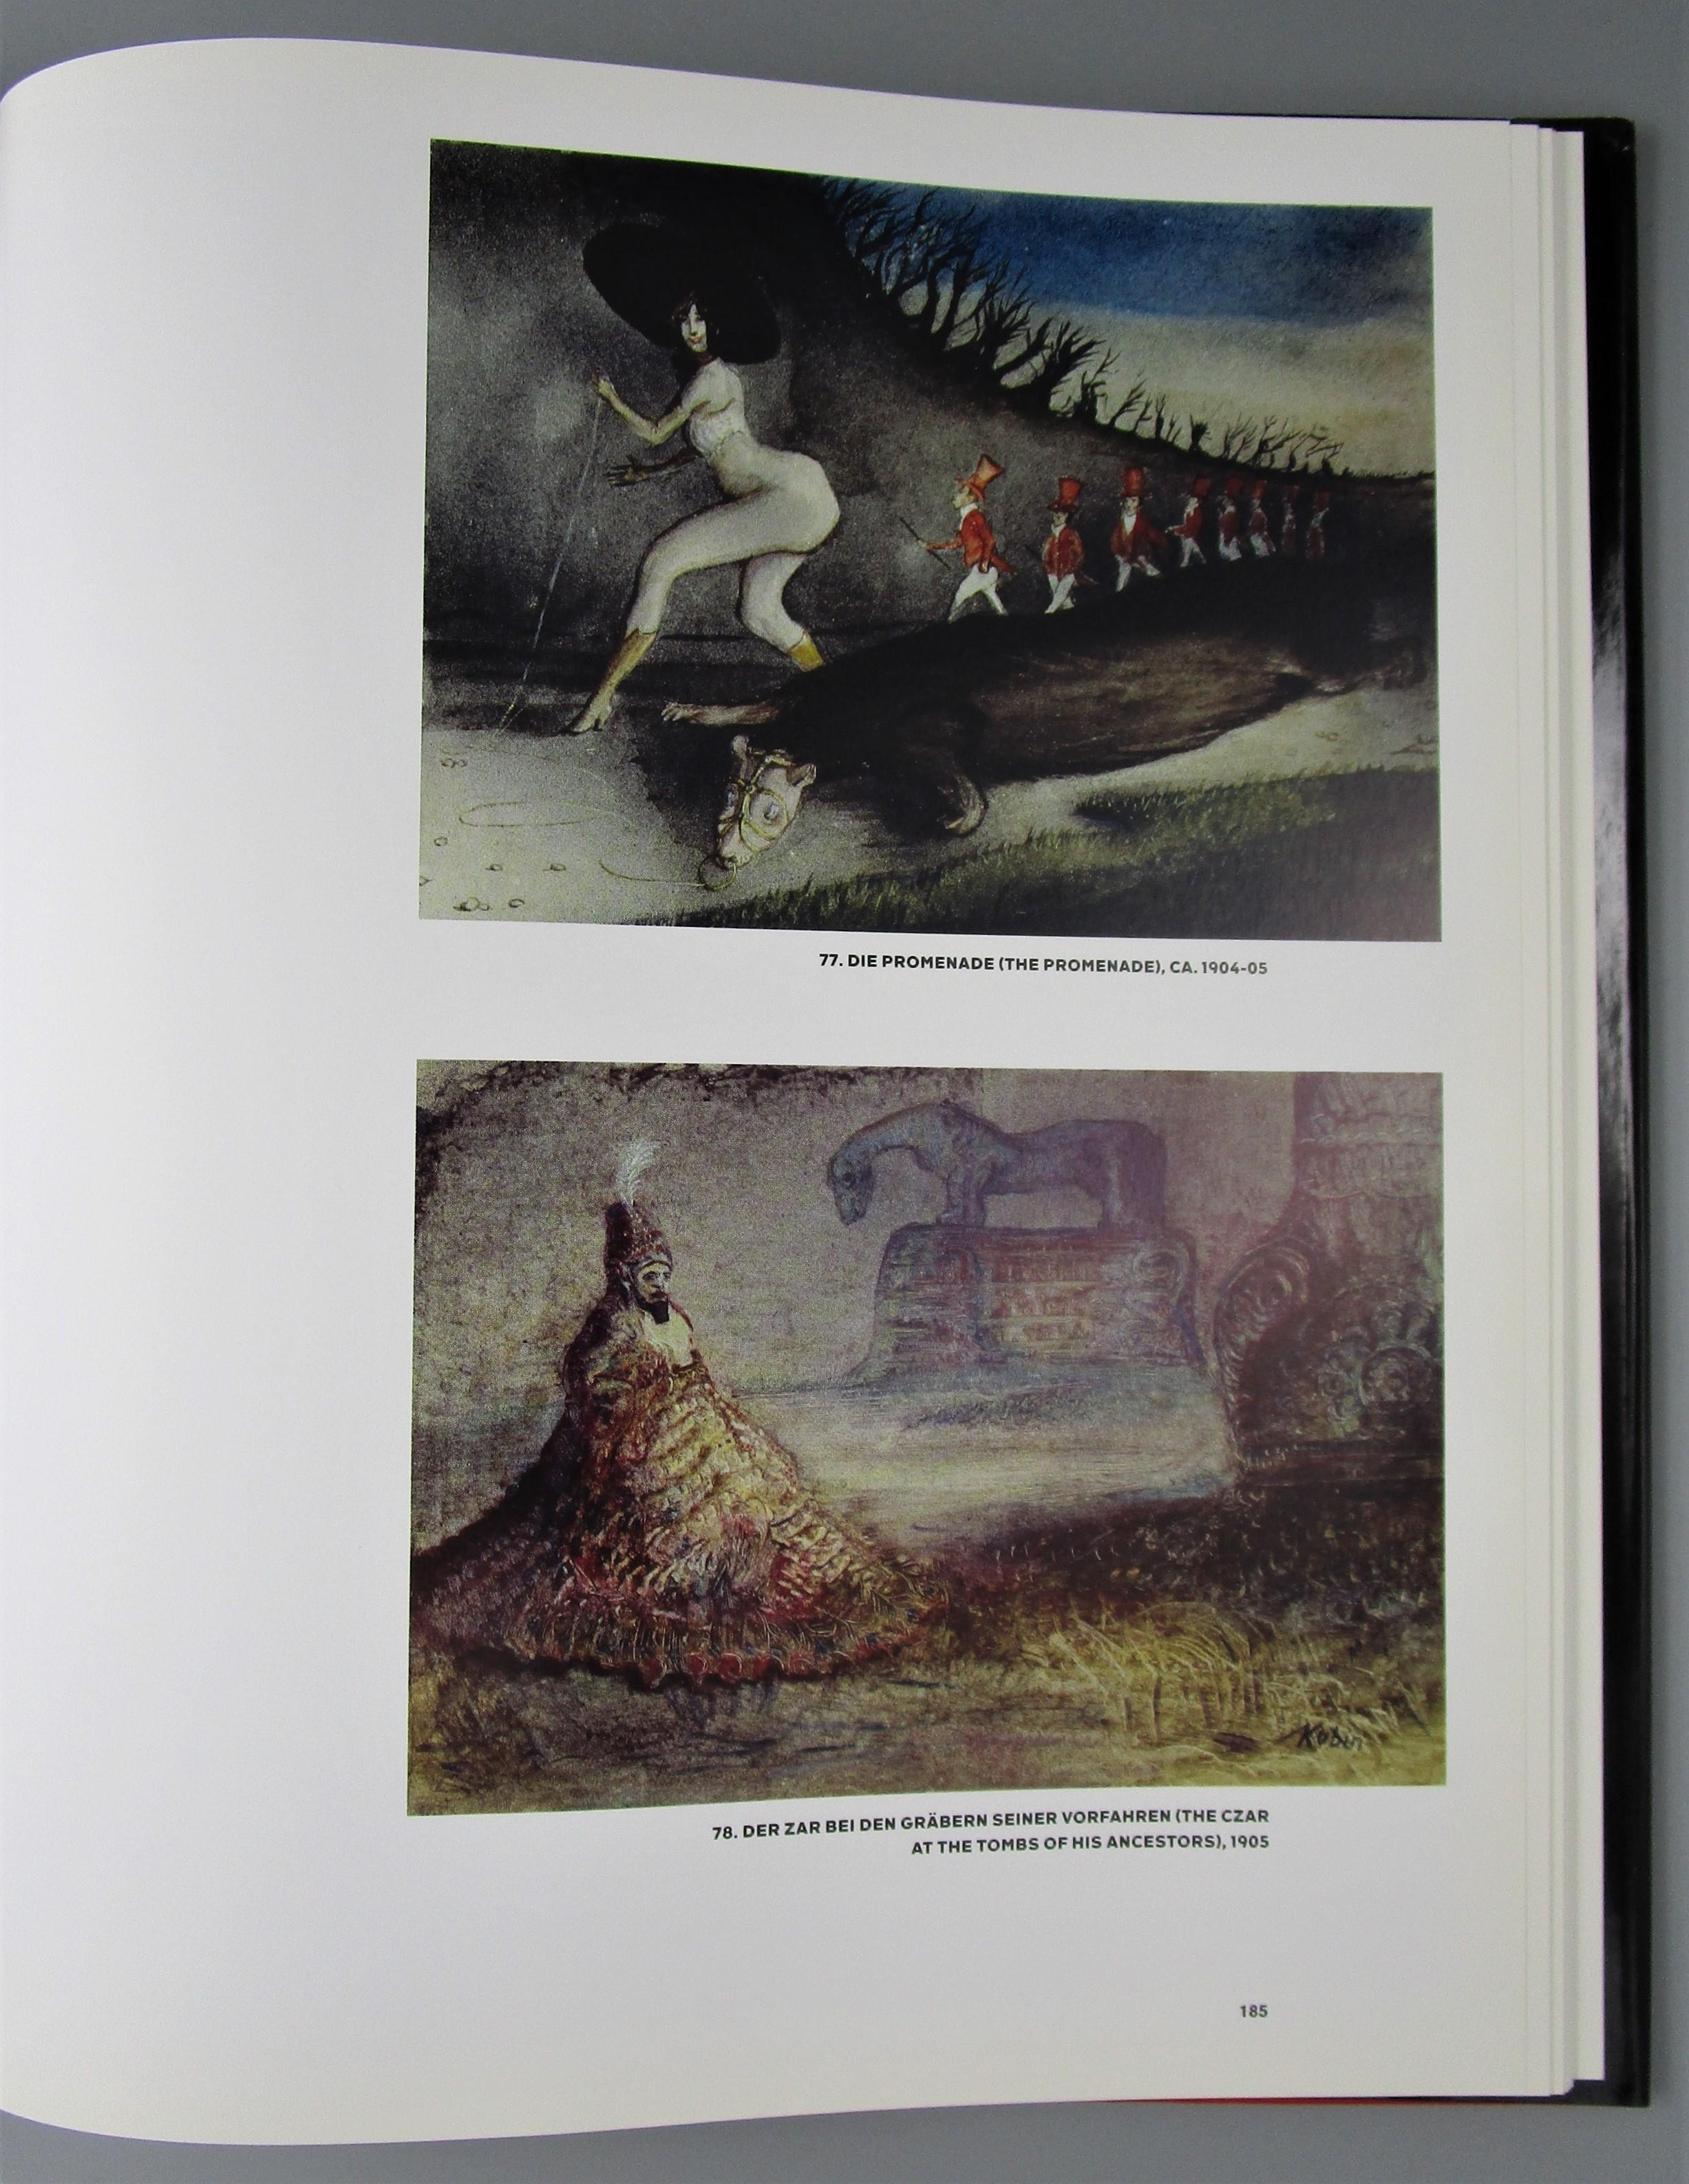 ALFRED KUBIN DRAWINGS 1897 - 1909, by Annegret Hoberg - 2008